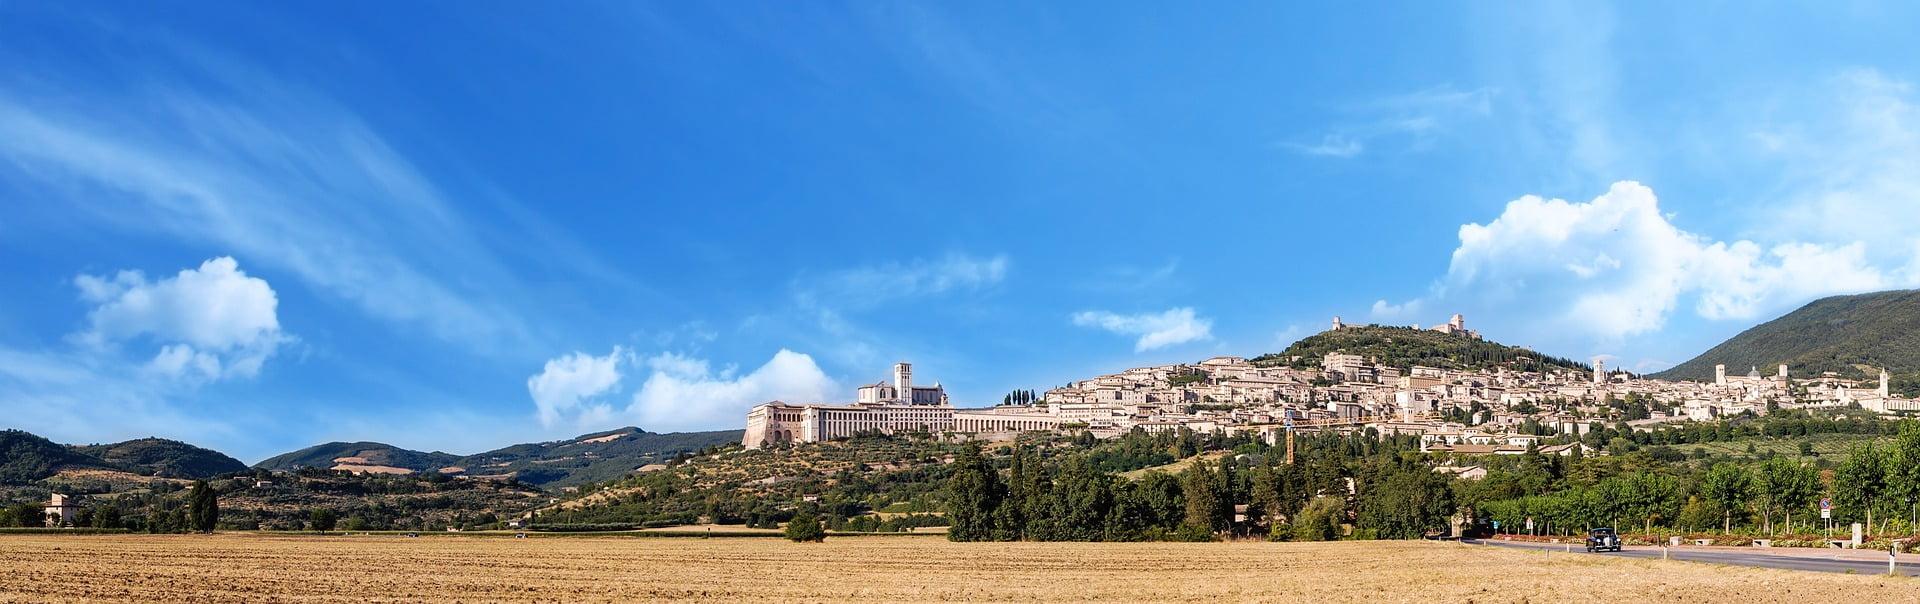 Italië | Wandelvakantie Sint Franciscus Route